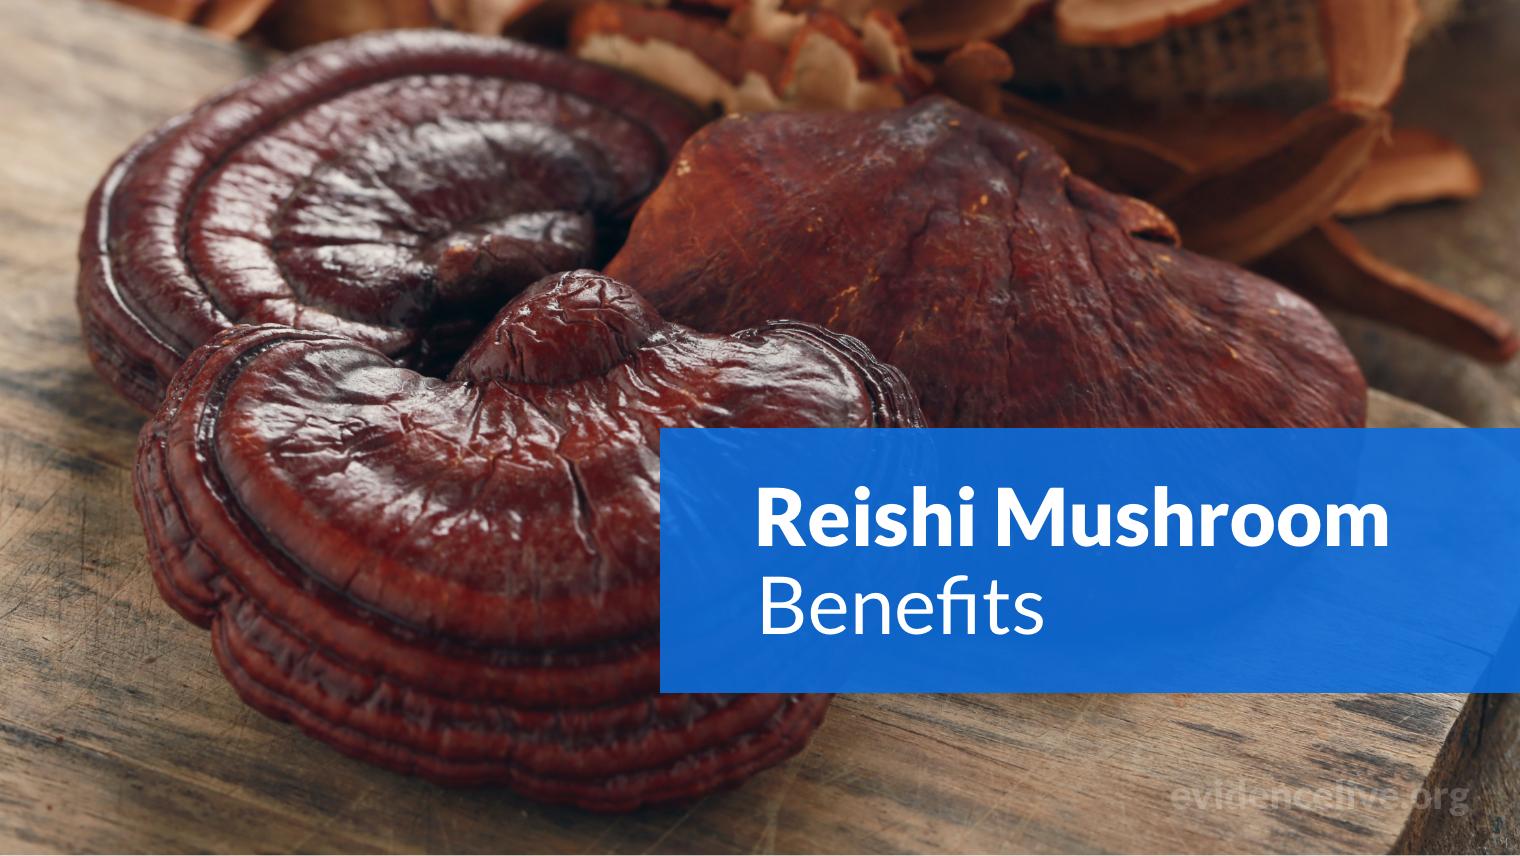 Reishi Mushroom Benefits: Is It Helpful Adaptogen For Brain?